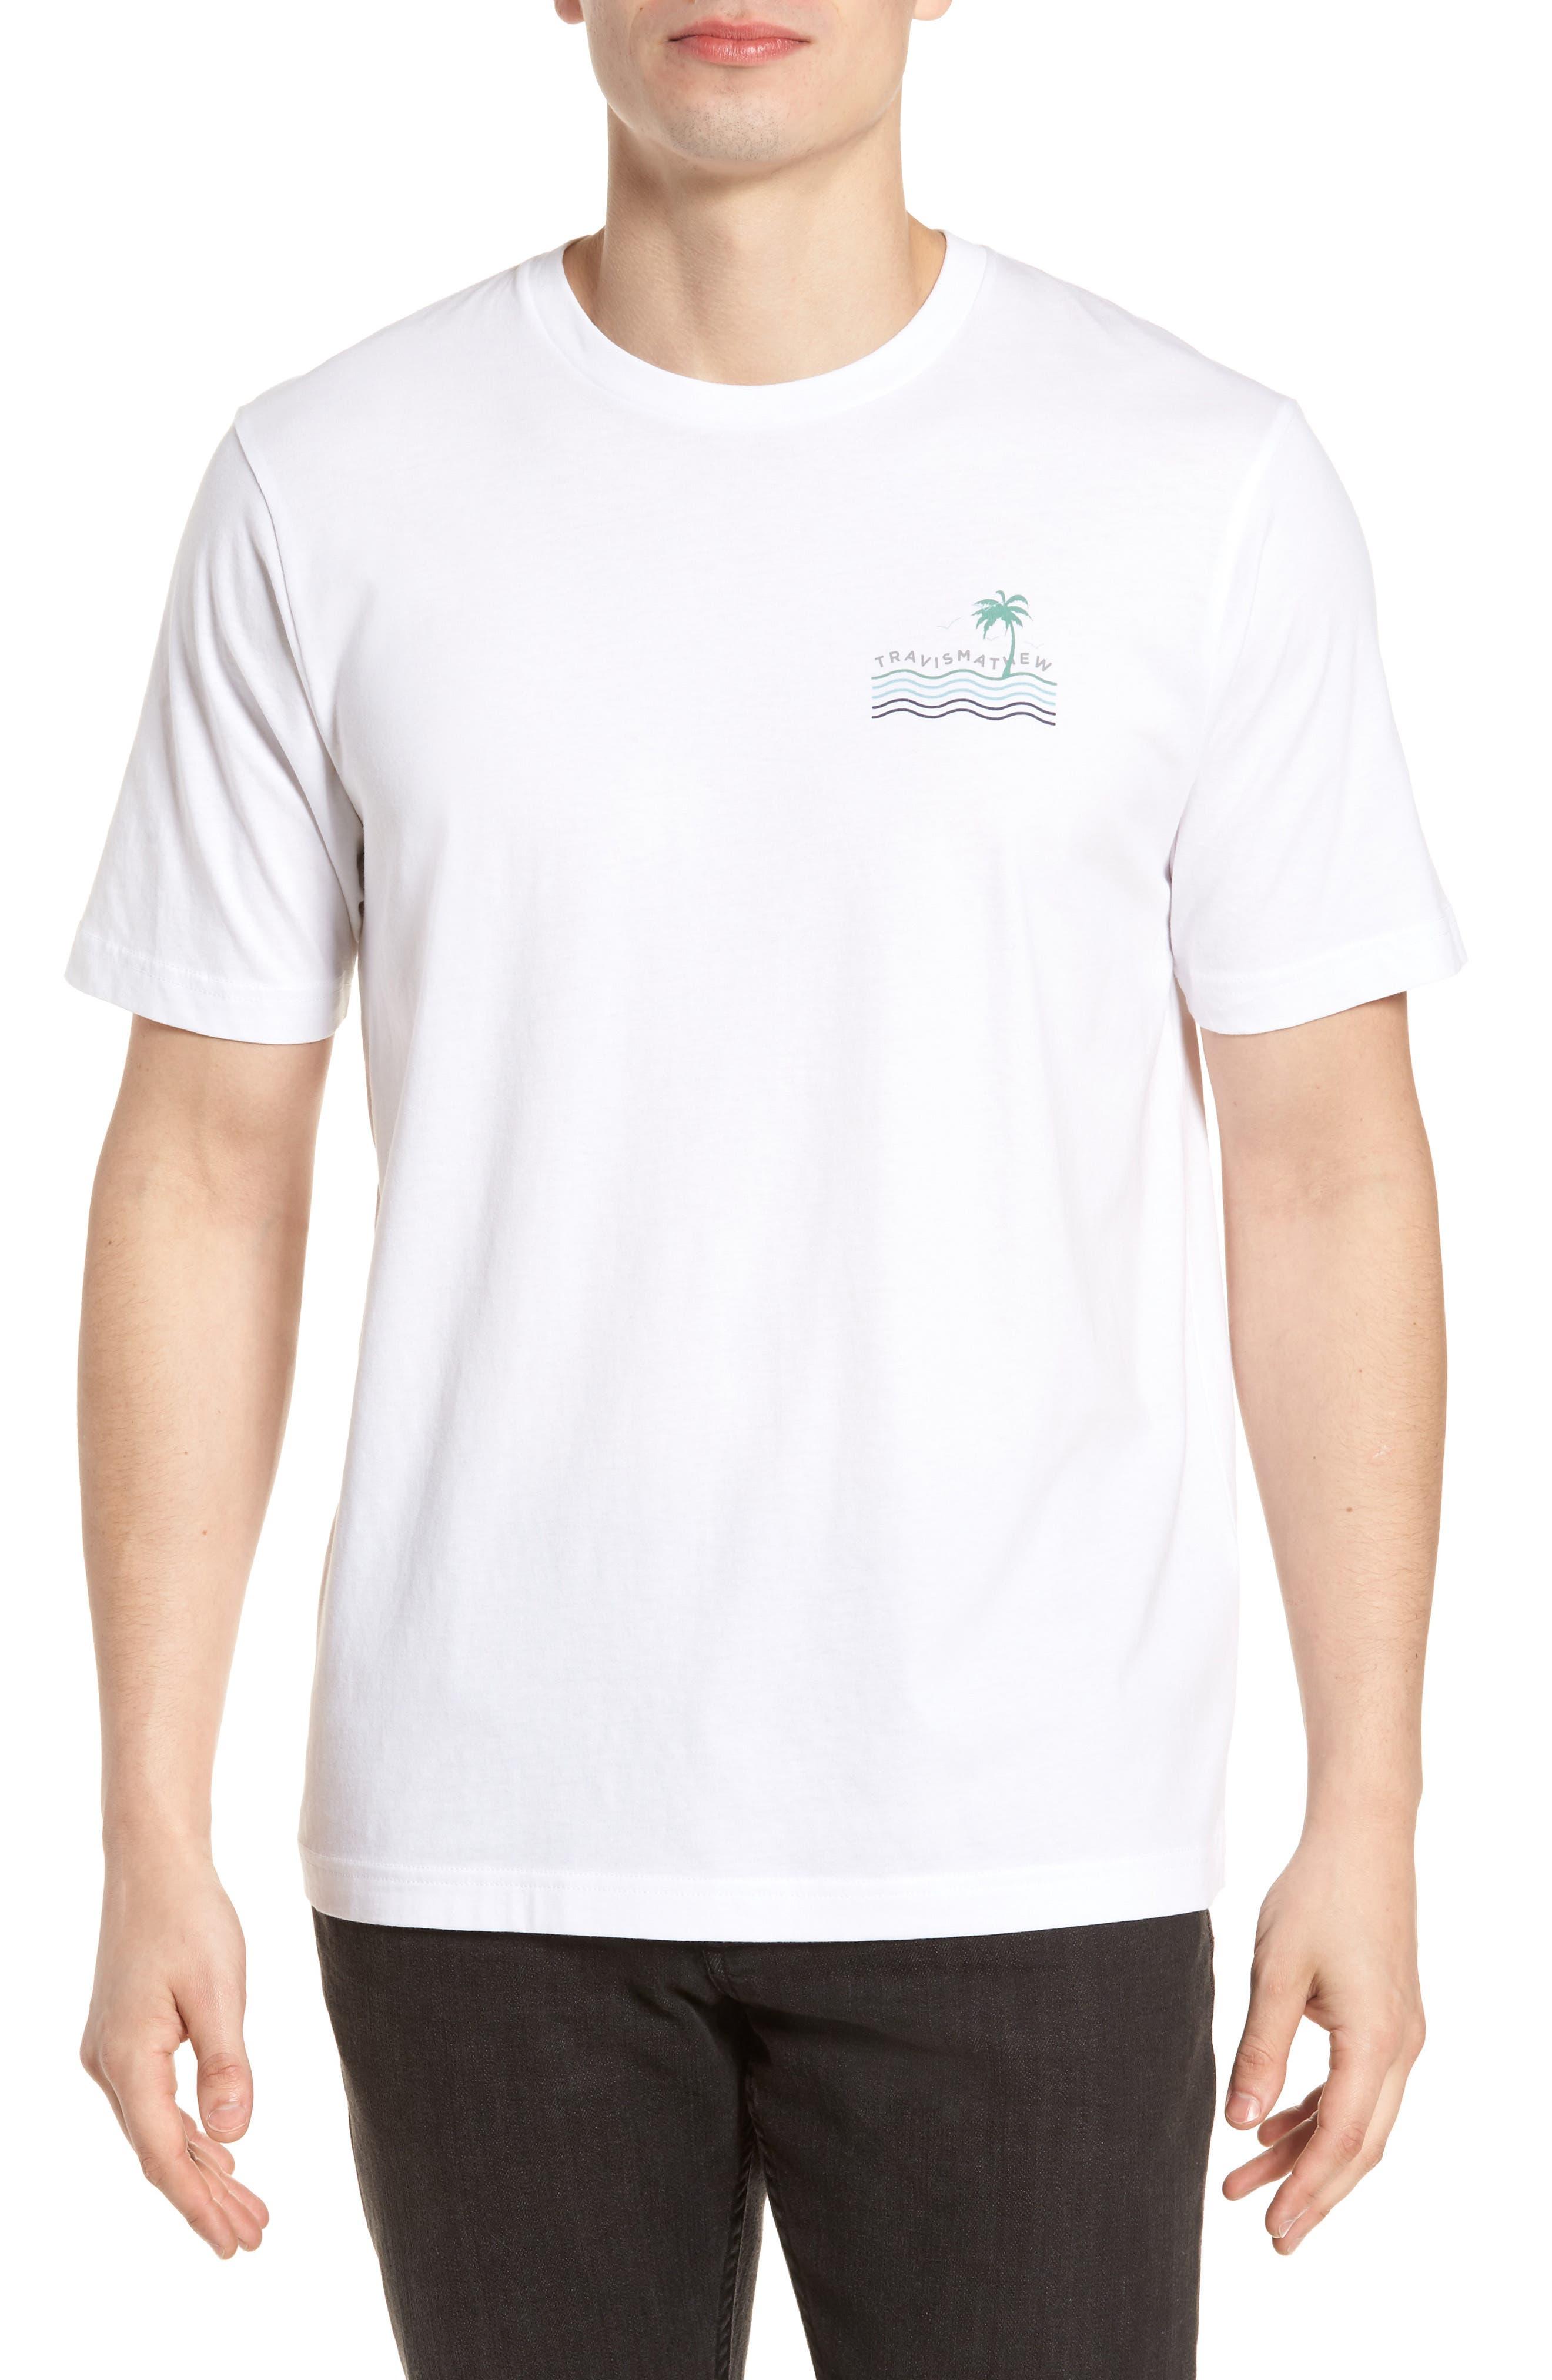 Main Image - Travis Mathew Double Take Graphic T-Shirt